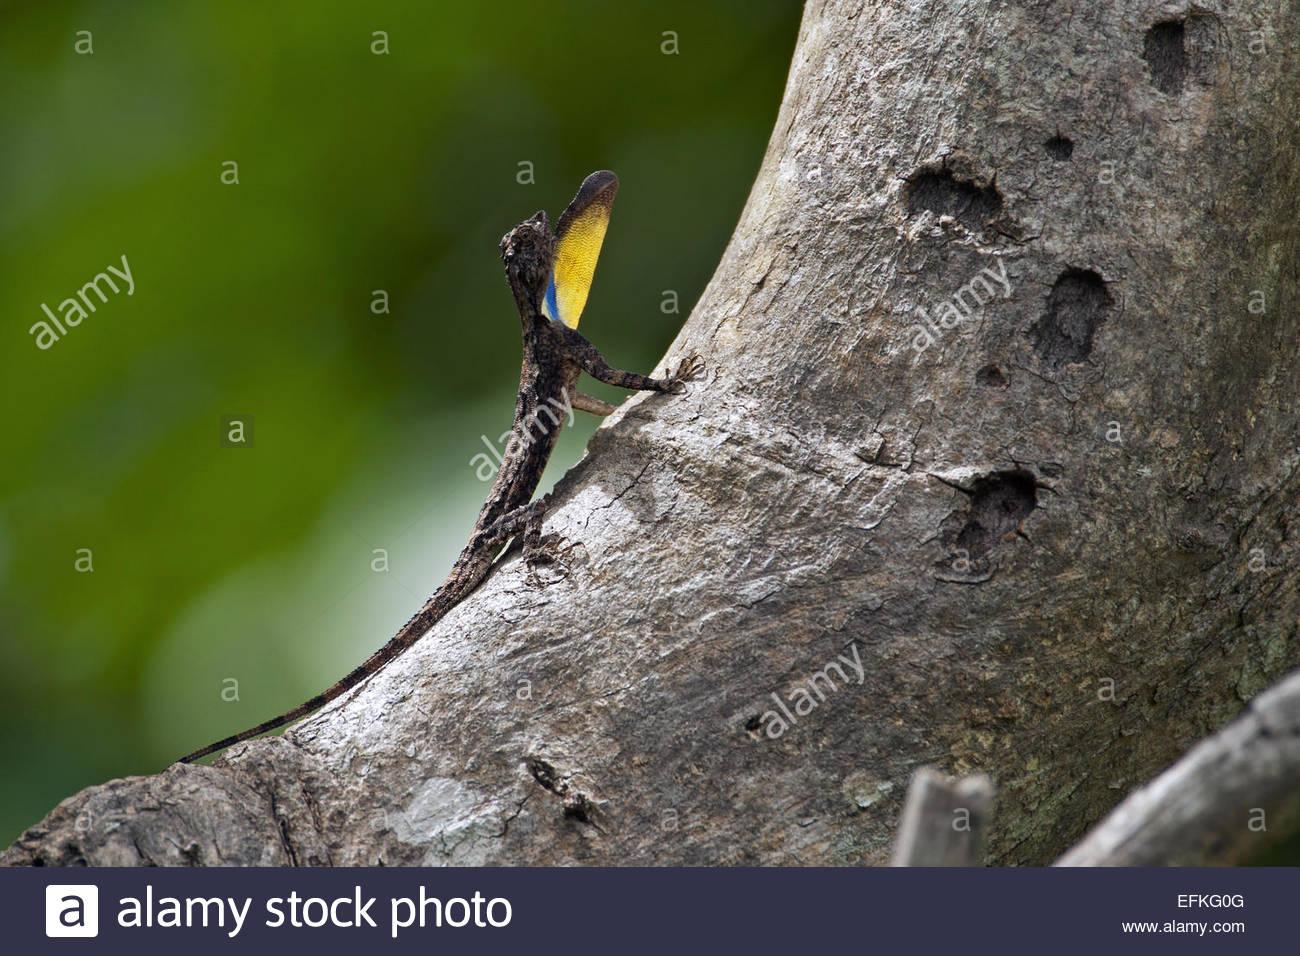 Spotted flying dragon (Draco maculatus maculatus) showing yellow gular flag - Stock Image